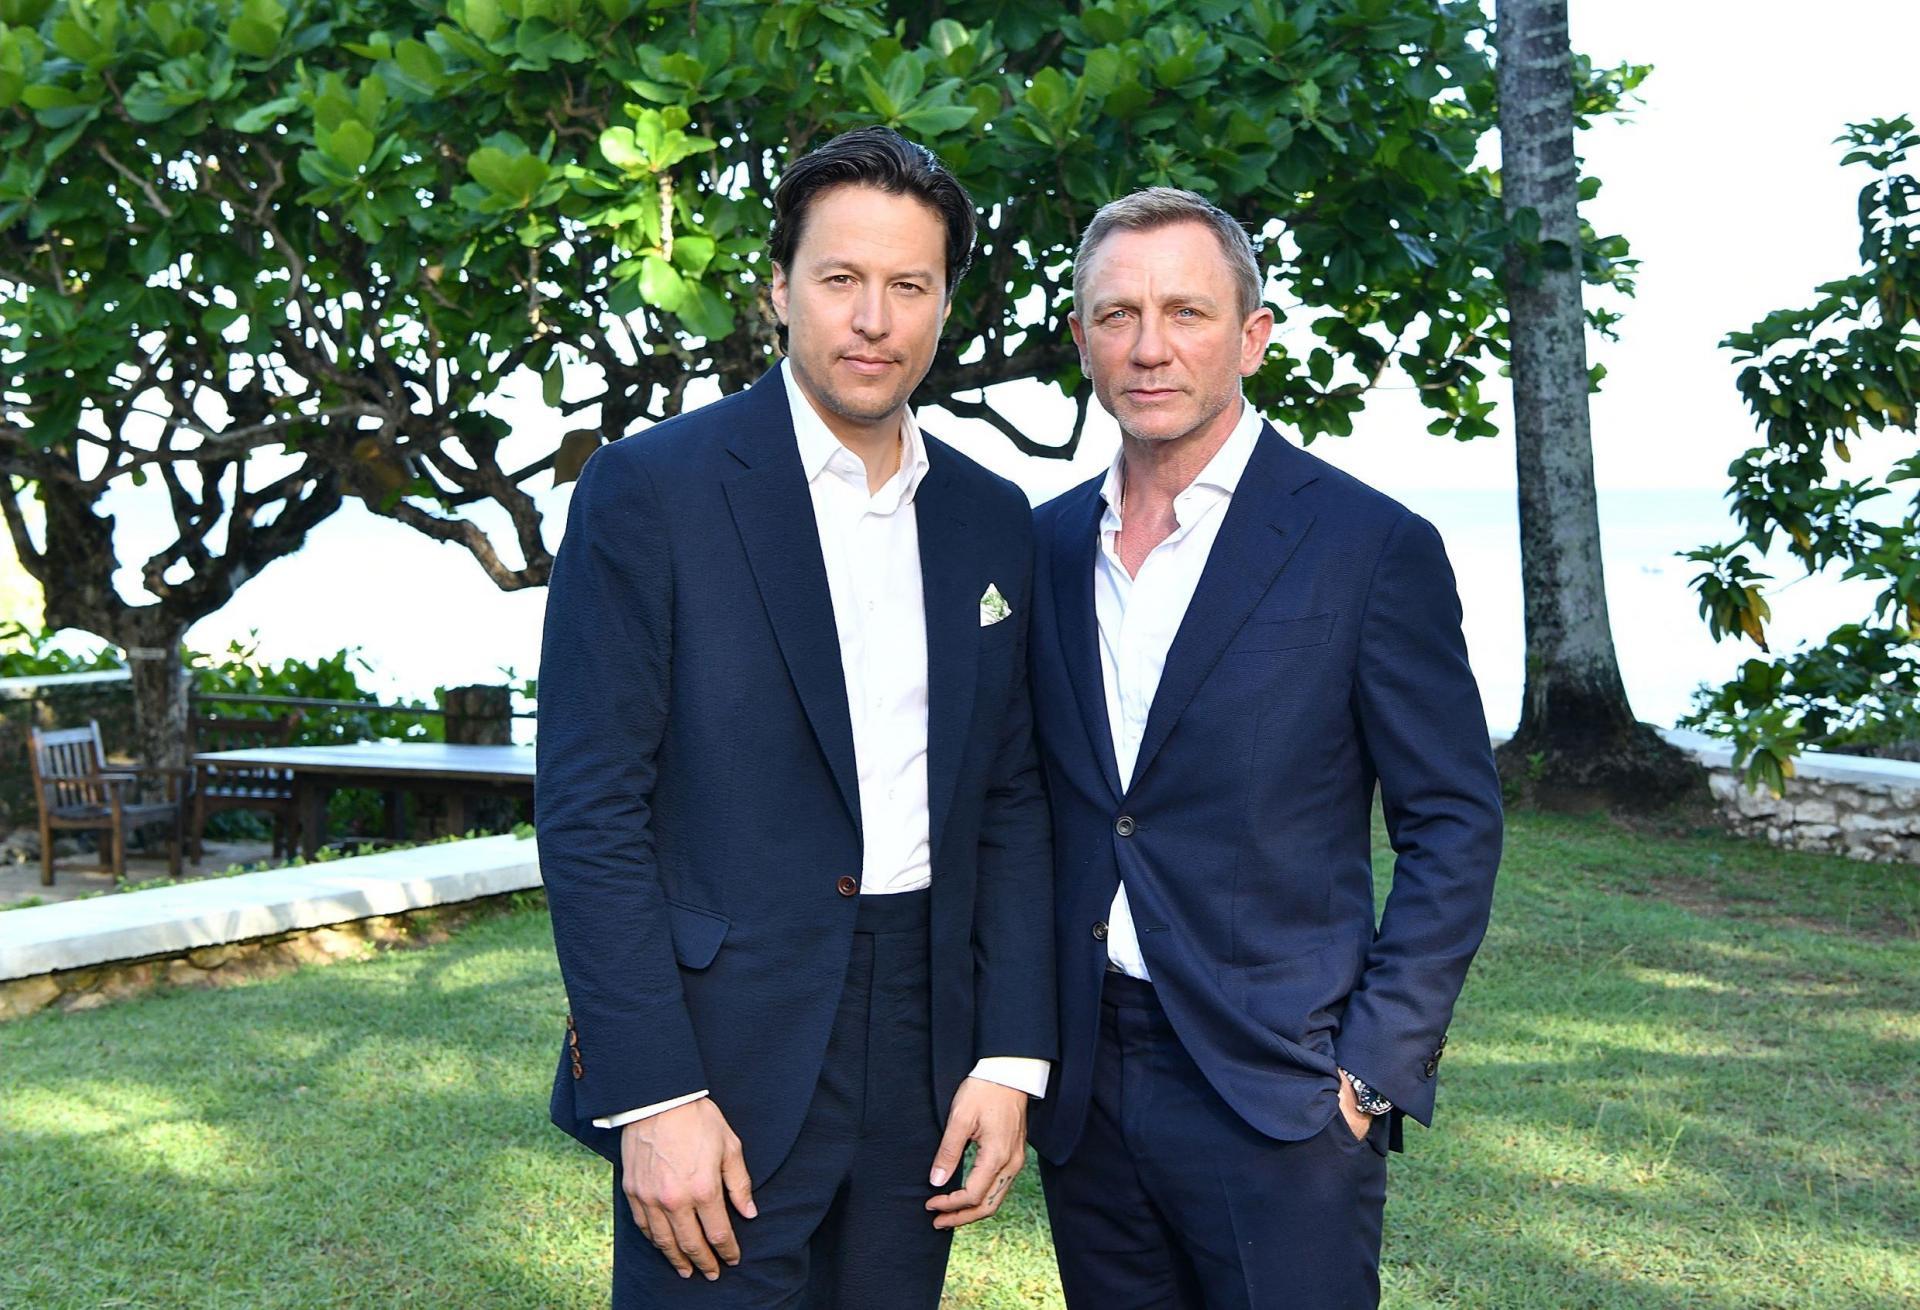 Director Cary Joji Fukunaga (left) and Daniel Craig. Photo: Slaven Vlasic/Getty Images North America/Getty Images via AFP.